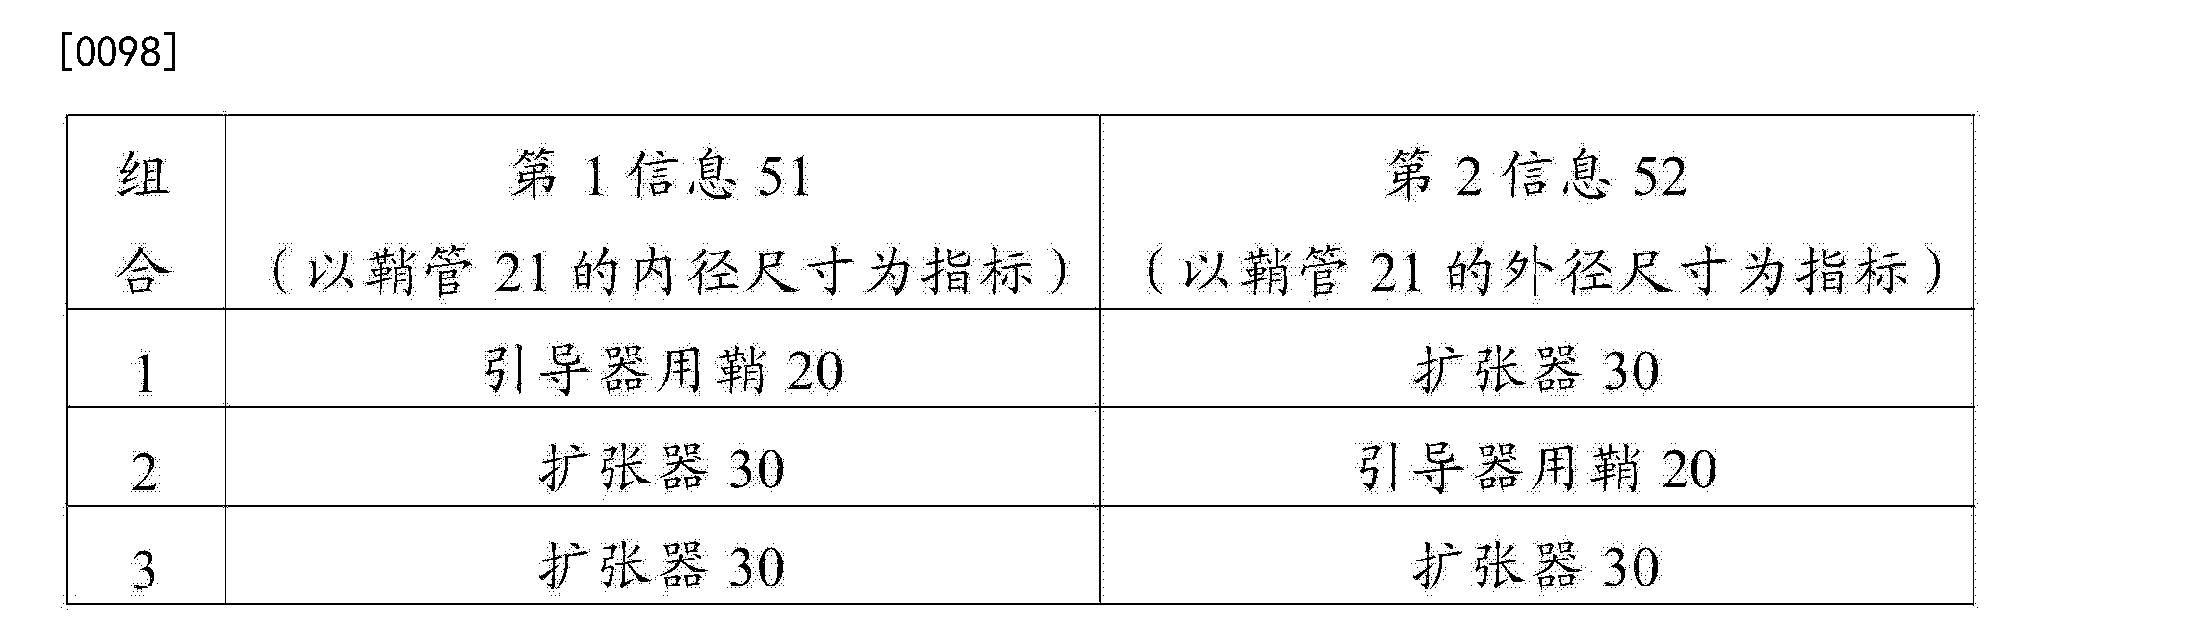 Figure CN204219577UD00101